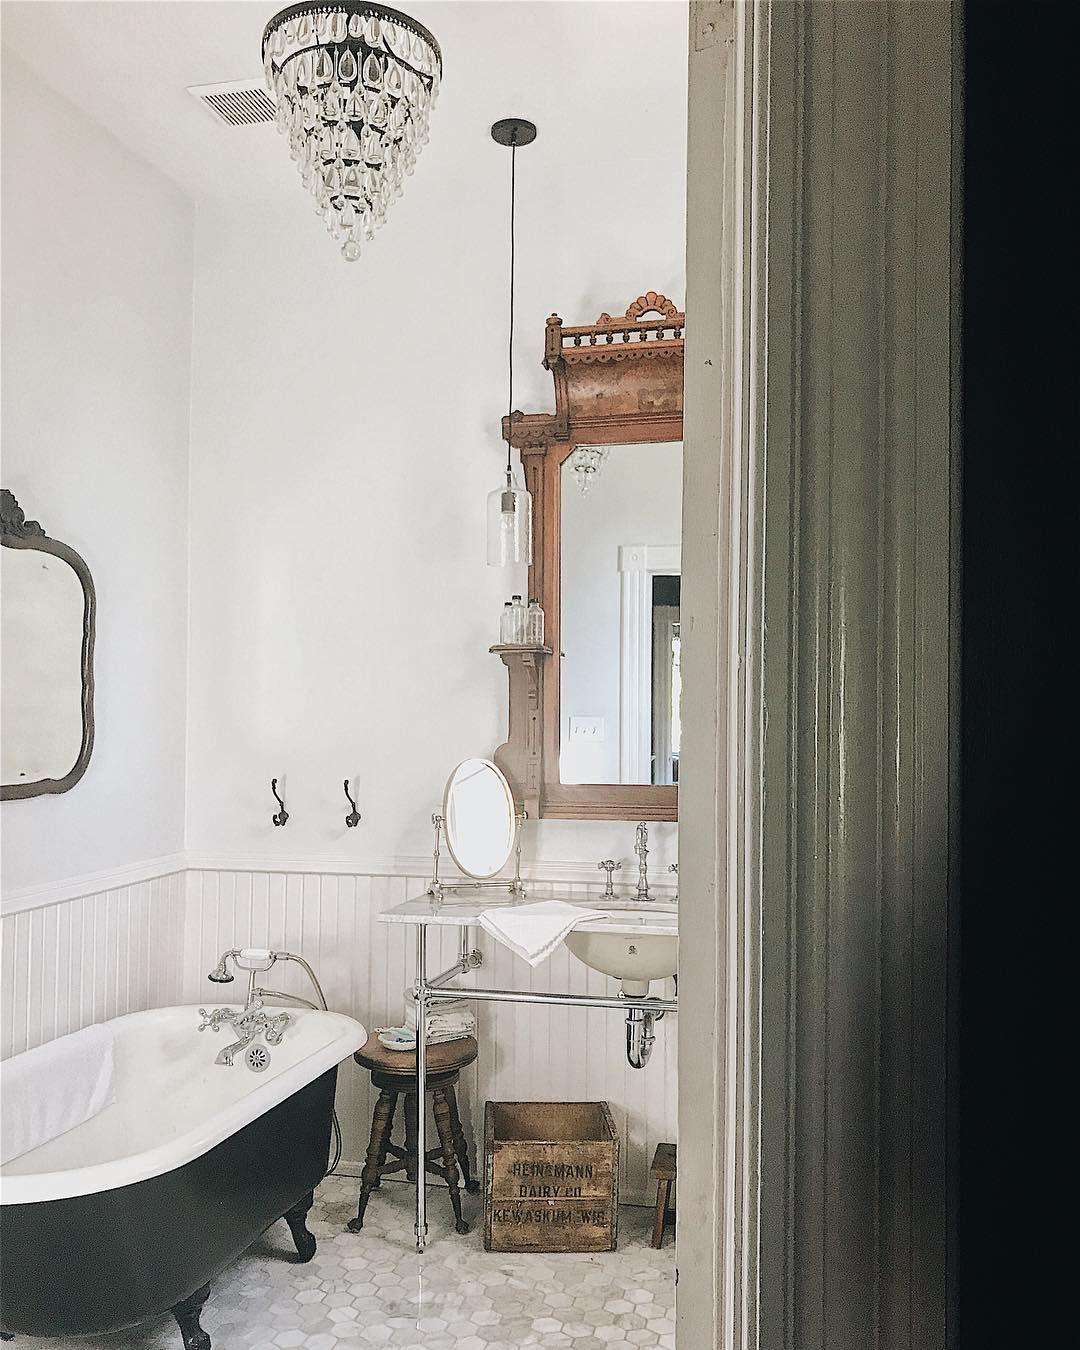 Pin by verdier mylene on deco salle de bain   Pinterest   Bath ...